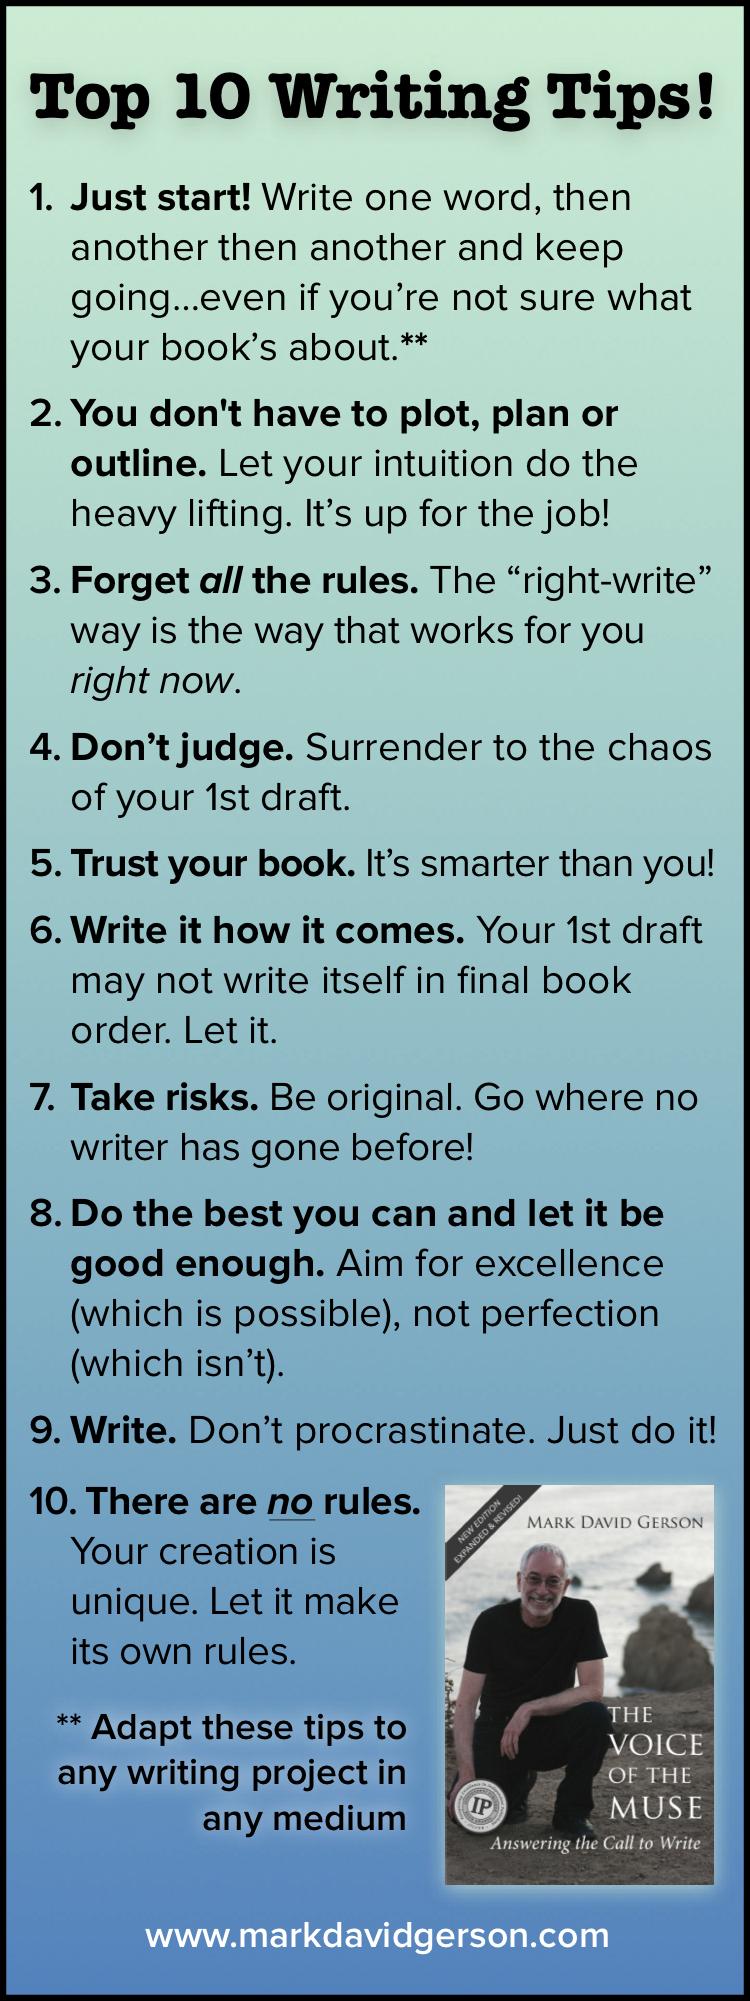 Top 10 Writing Tips.jpg